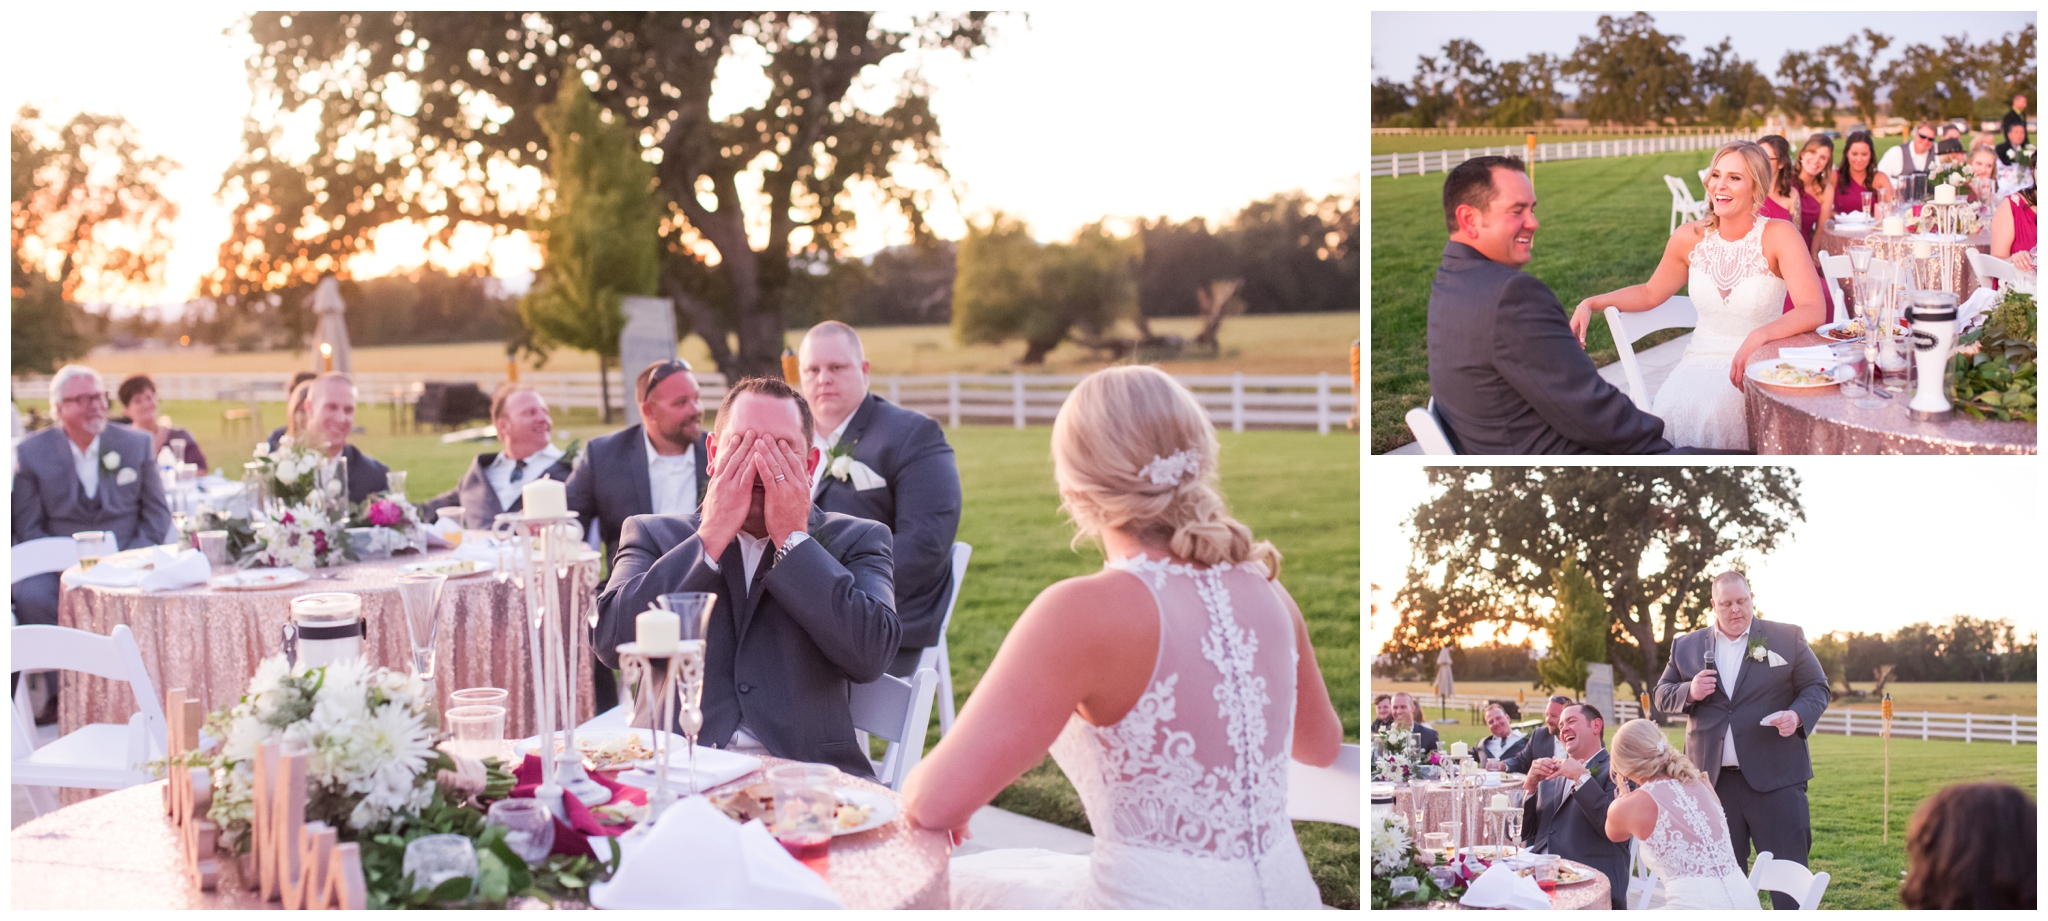 kassie_heath_cottonwood_wedding_blog_0035.jpg